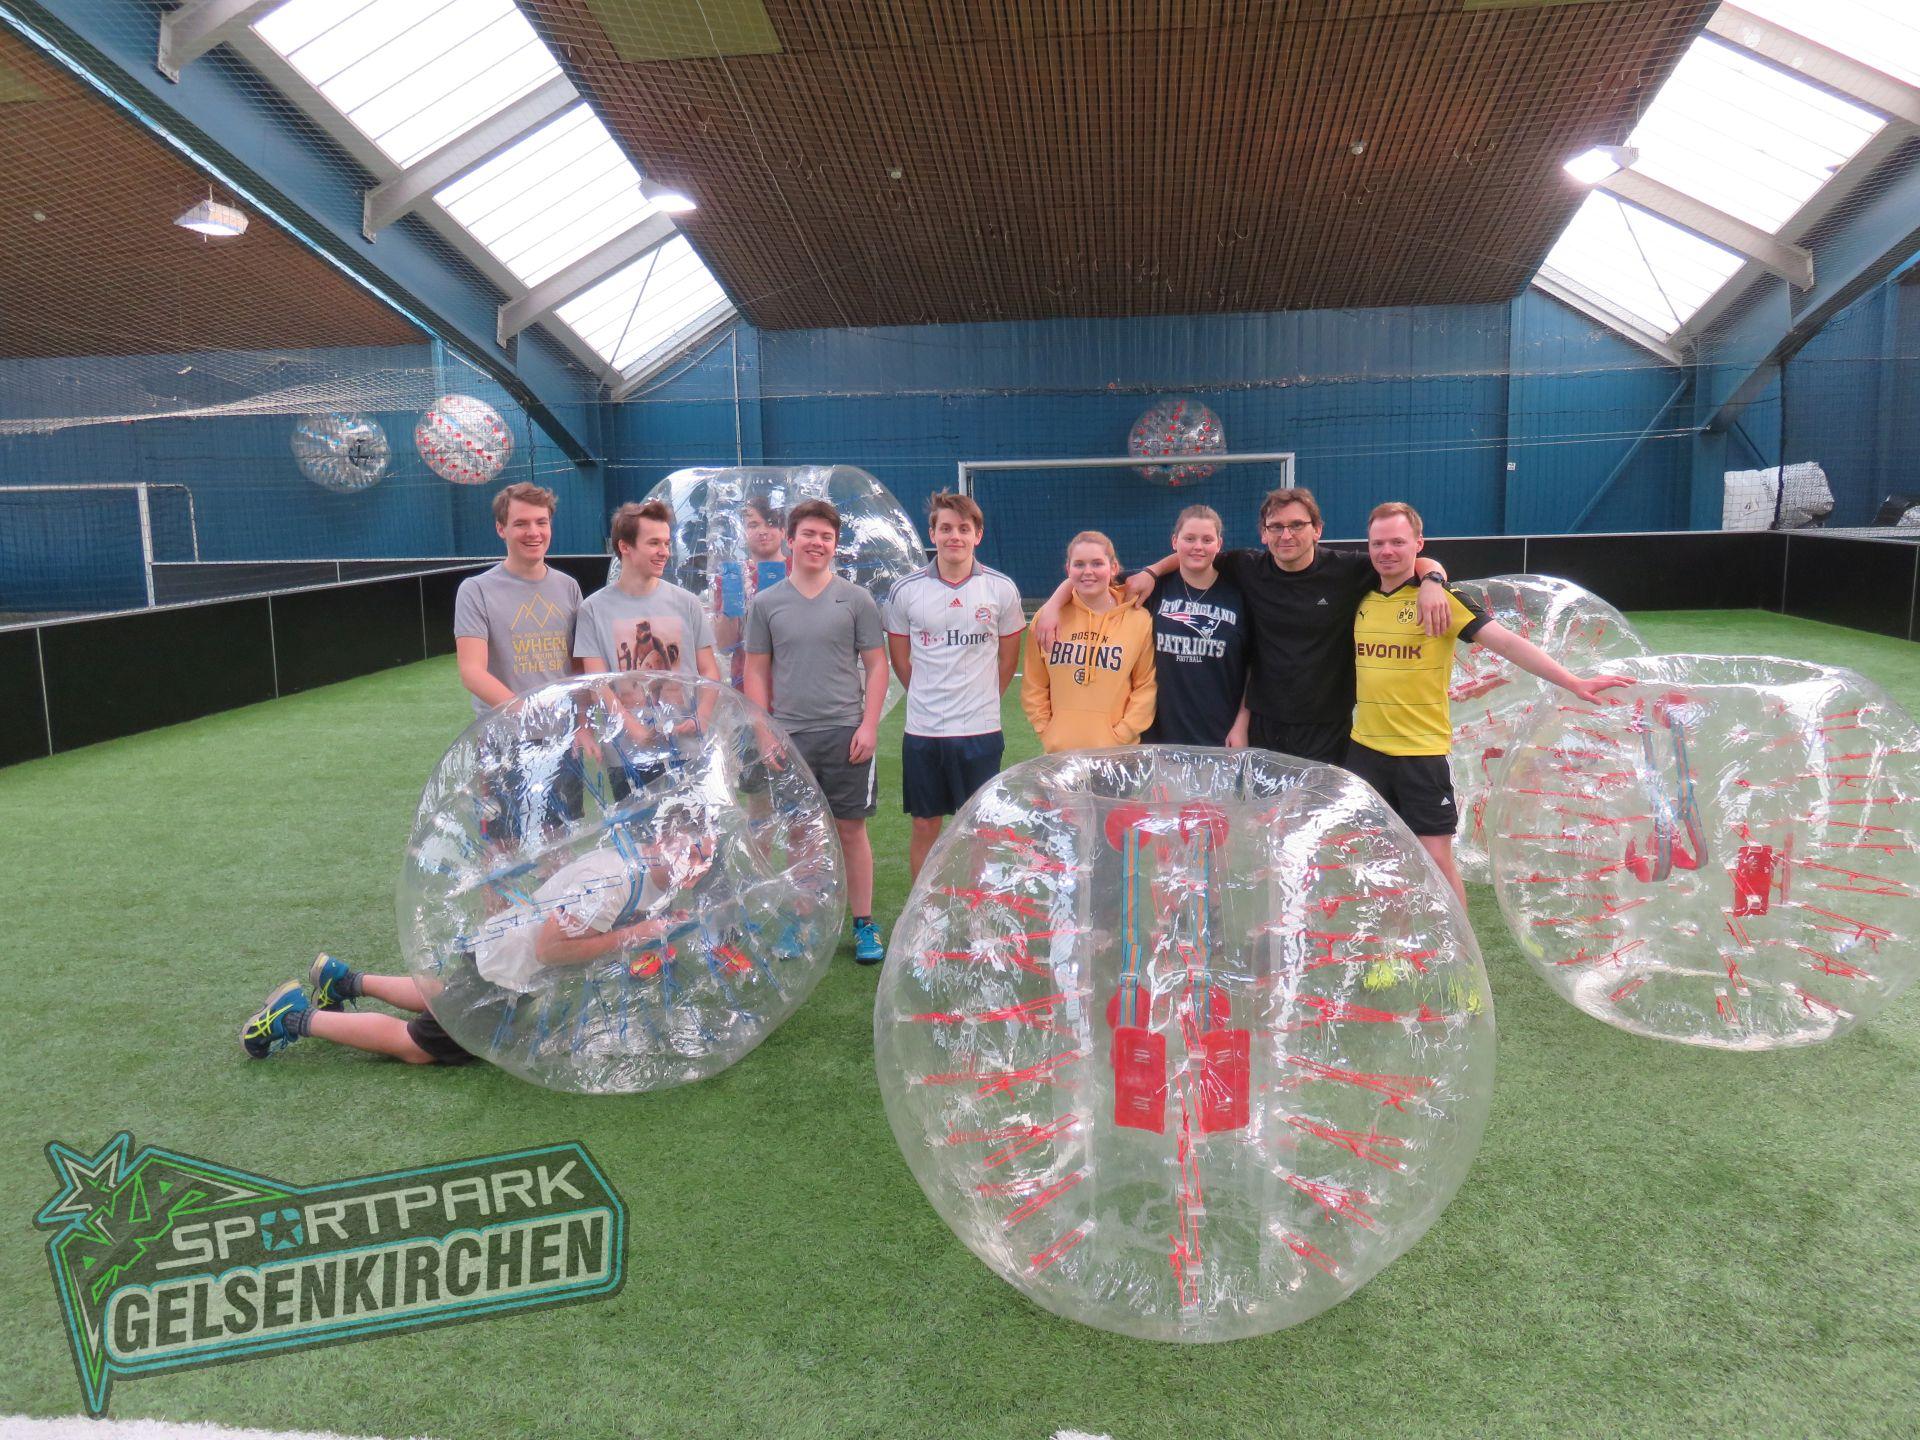 Sportpark Gelsenkirchen Bubble Ball